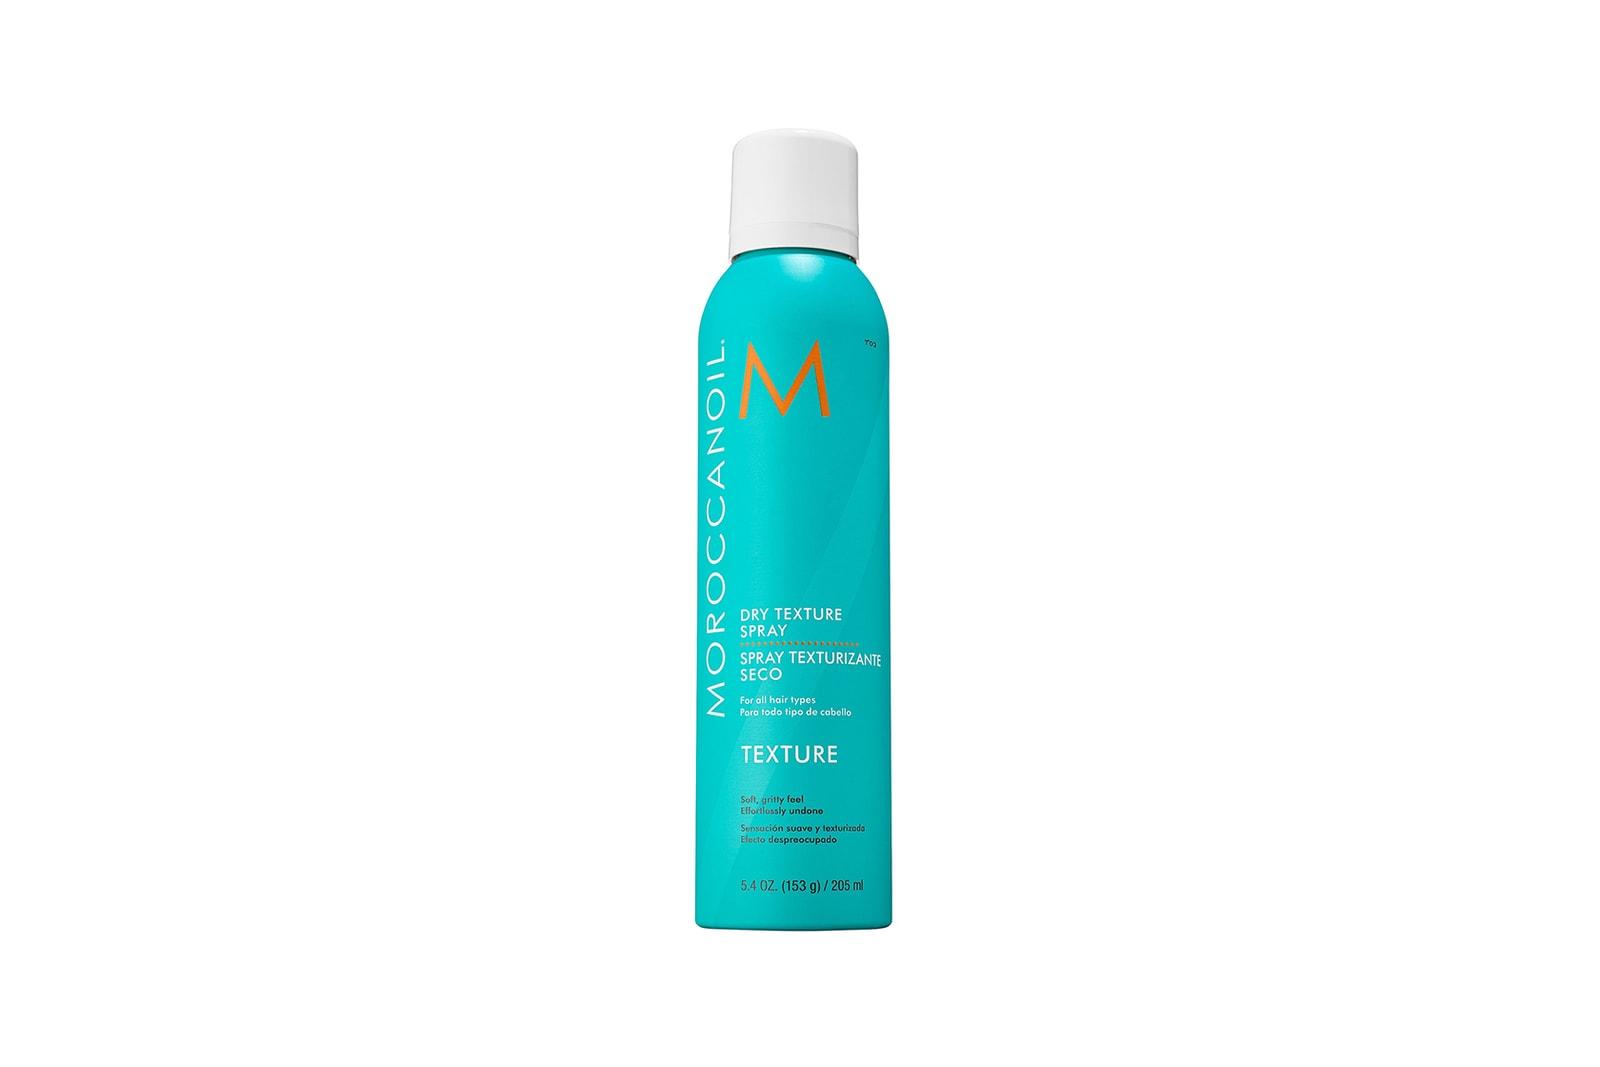 hair loss thinning locks shampoo conditioners shop buy spray powder dry oribe kiehls ouai bumble christophe robin living proof moroccan oil keratin biotin argan amika drybar